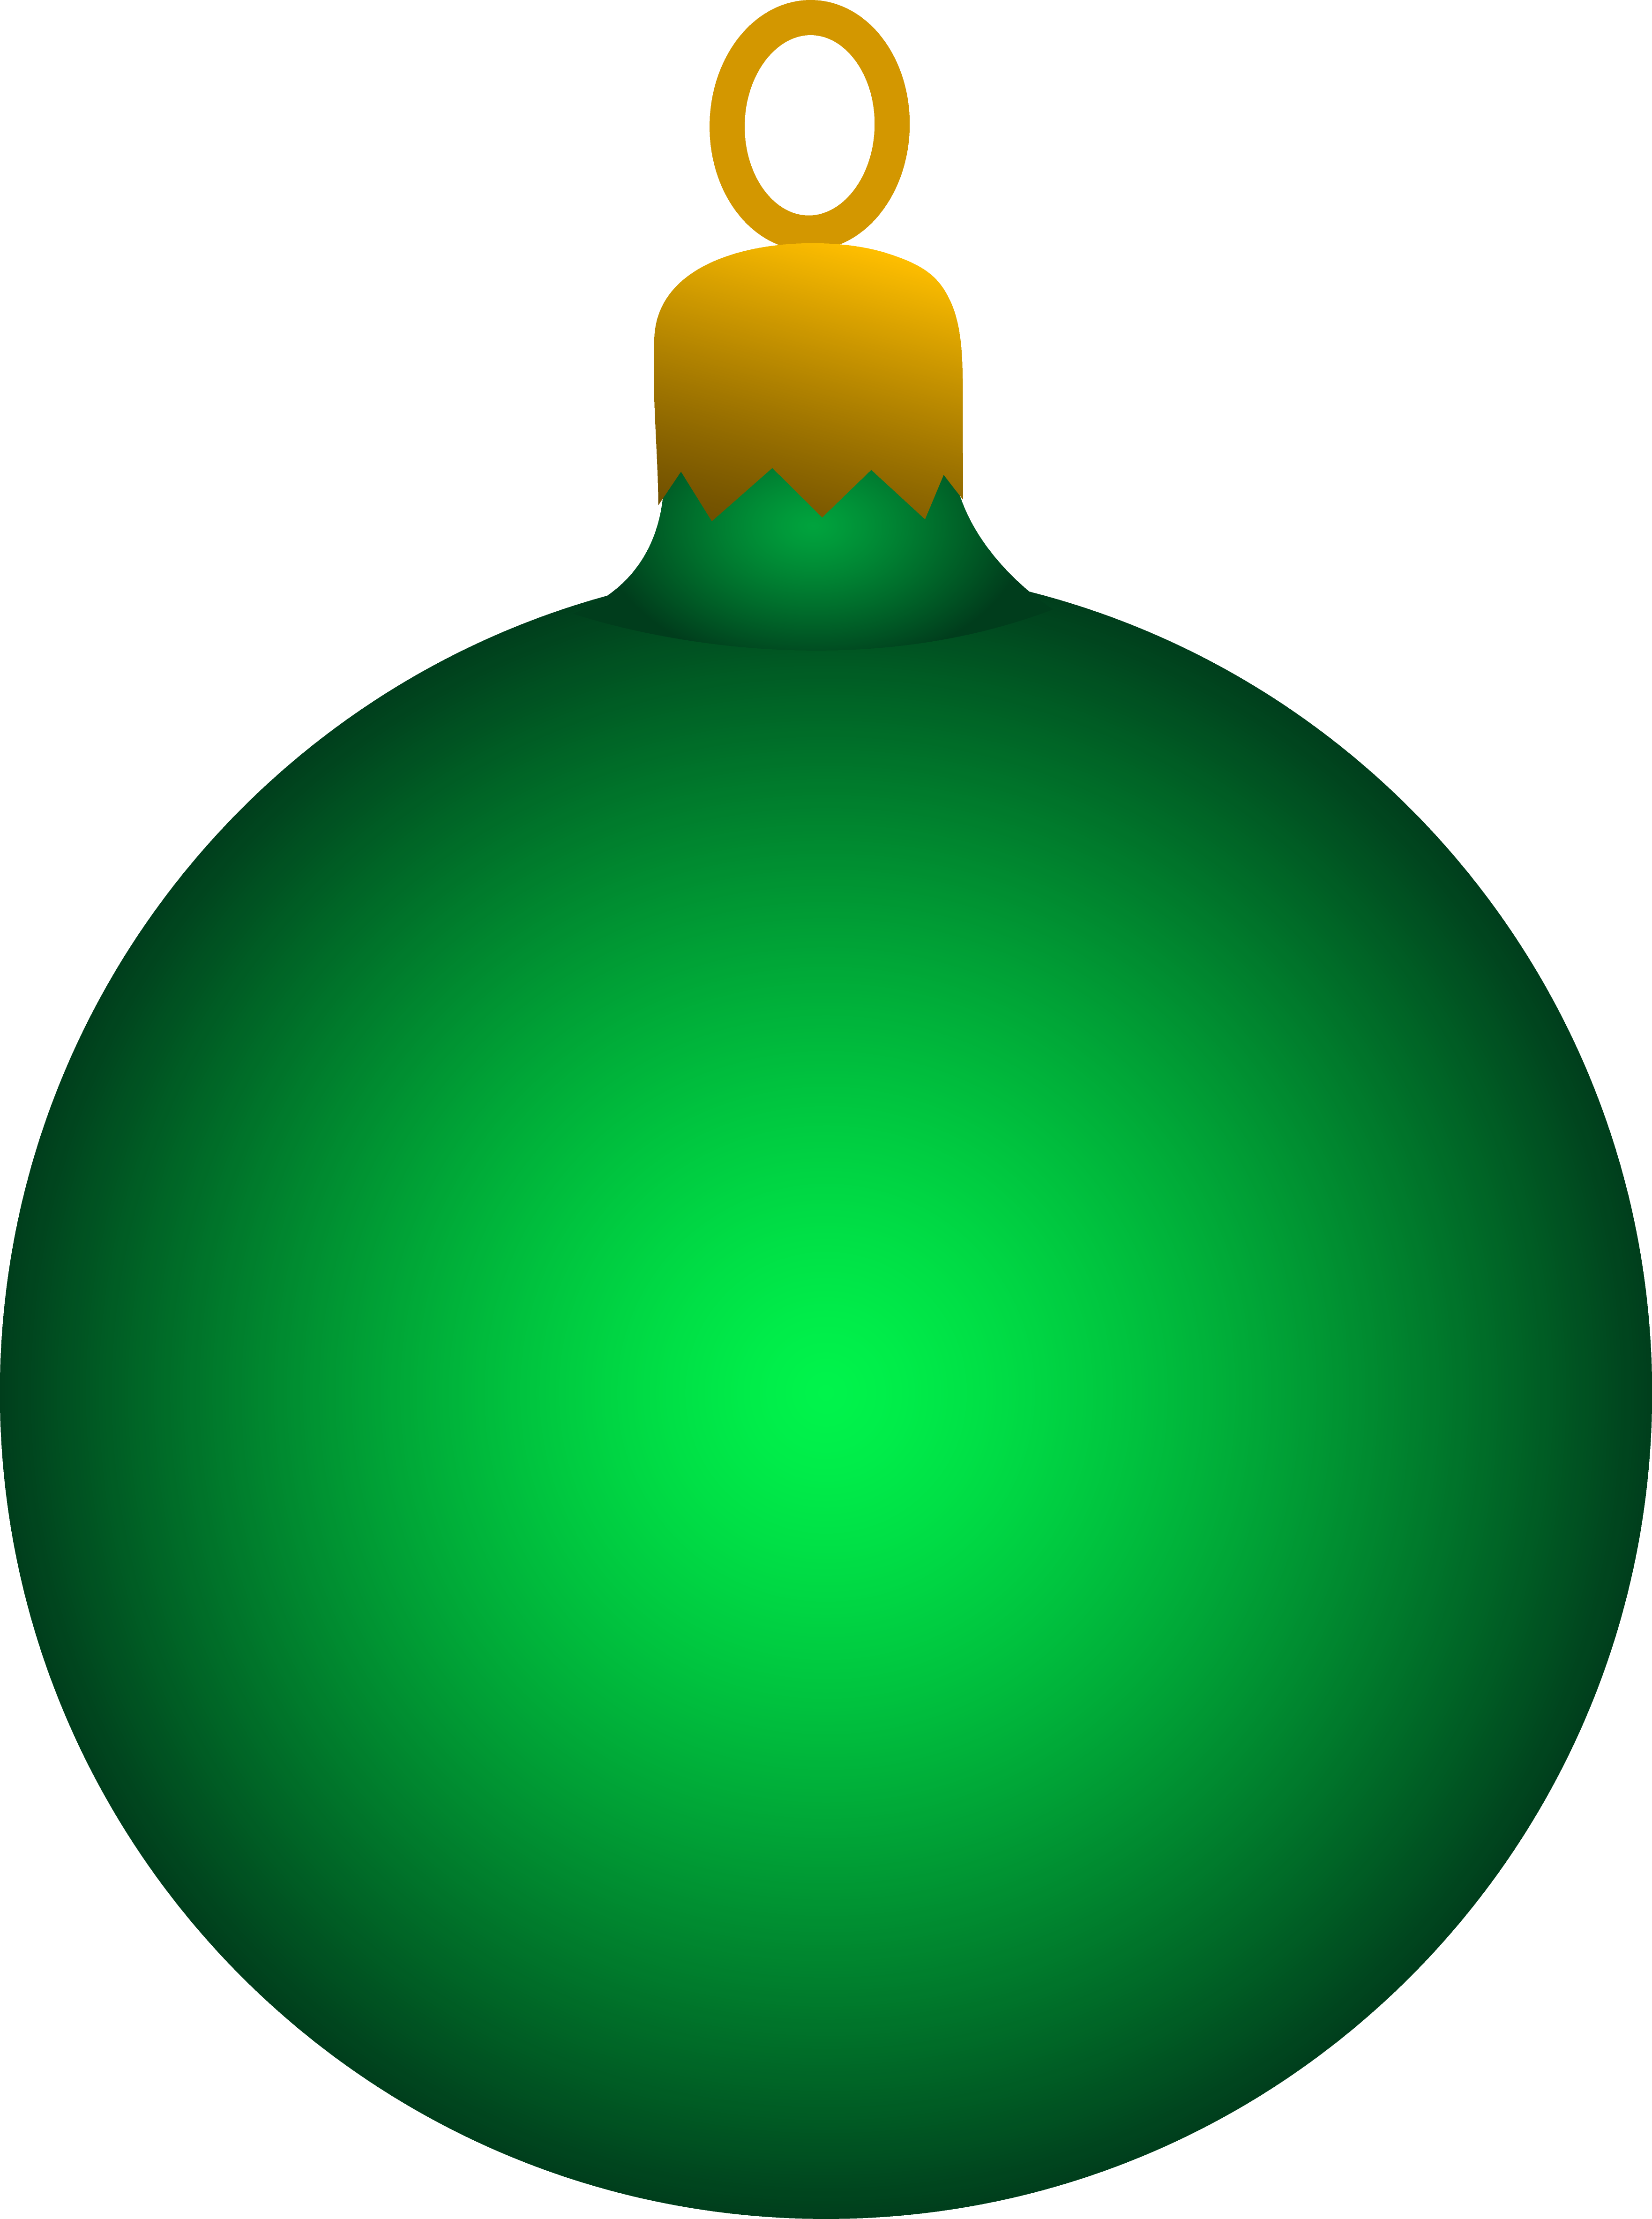 Ornament clipart line art. Christmas tree